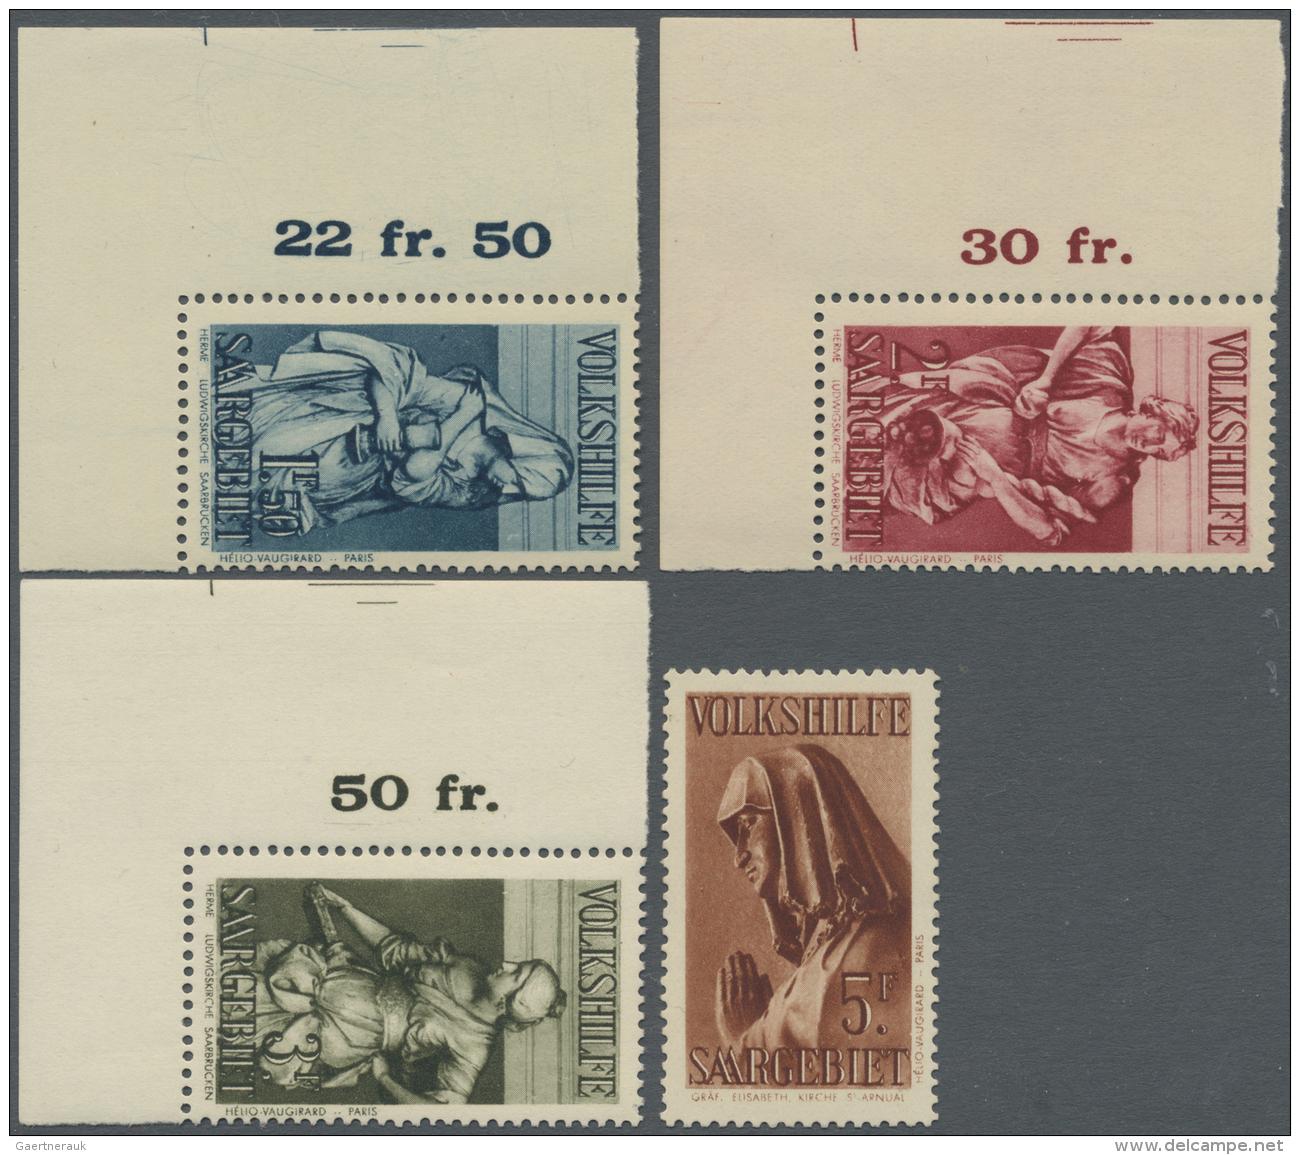 Deutsche Abstimmungsgebiete: Saargebiet: 1934, Volkshilfe Stadtbilder Aus Saarbrücker Kirchen Als Tadellos Postfris - 1920-35 League Of Nations